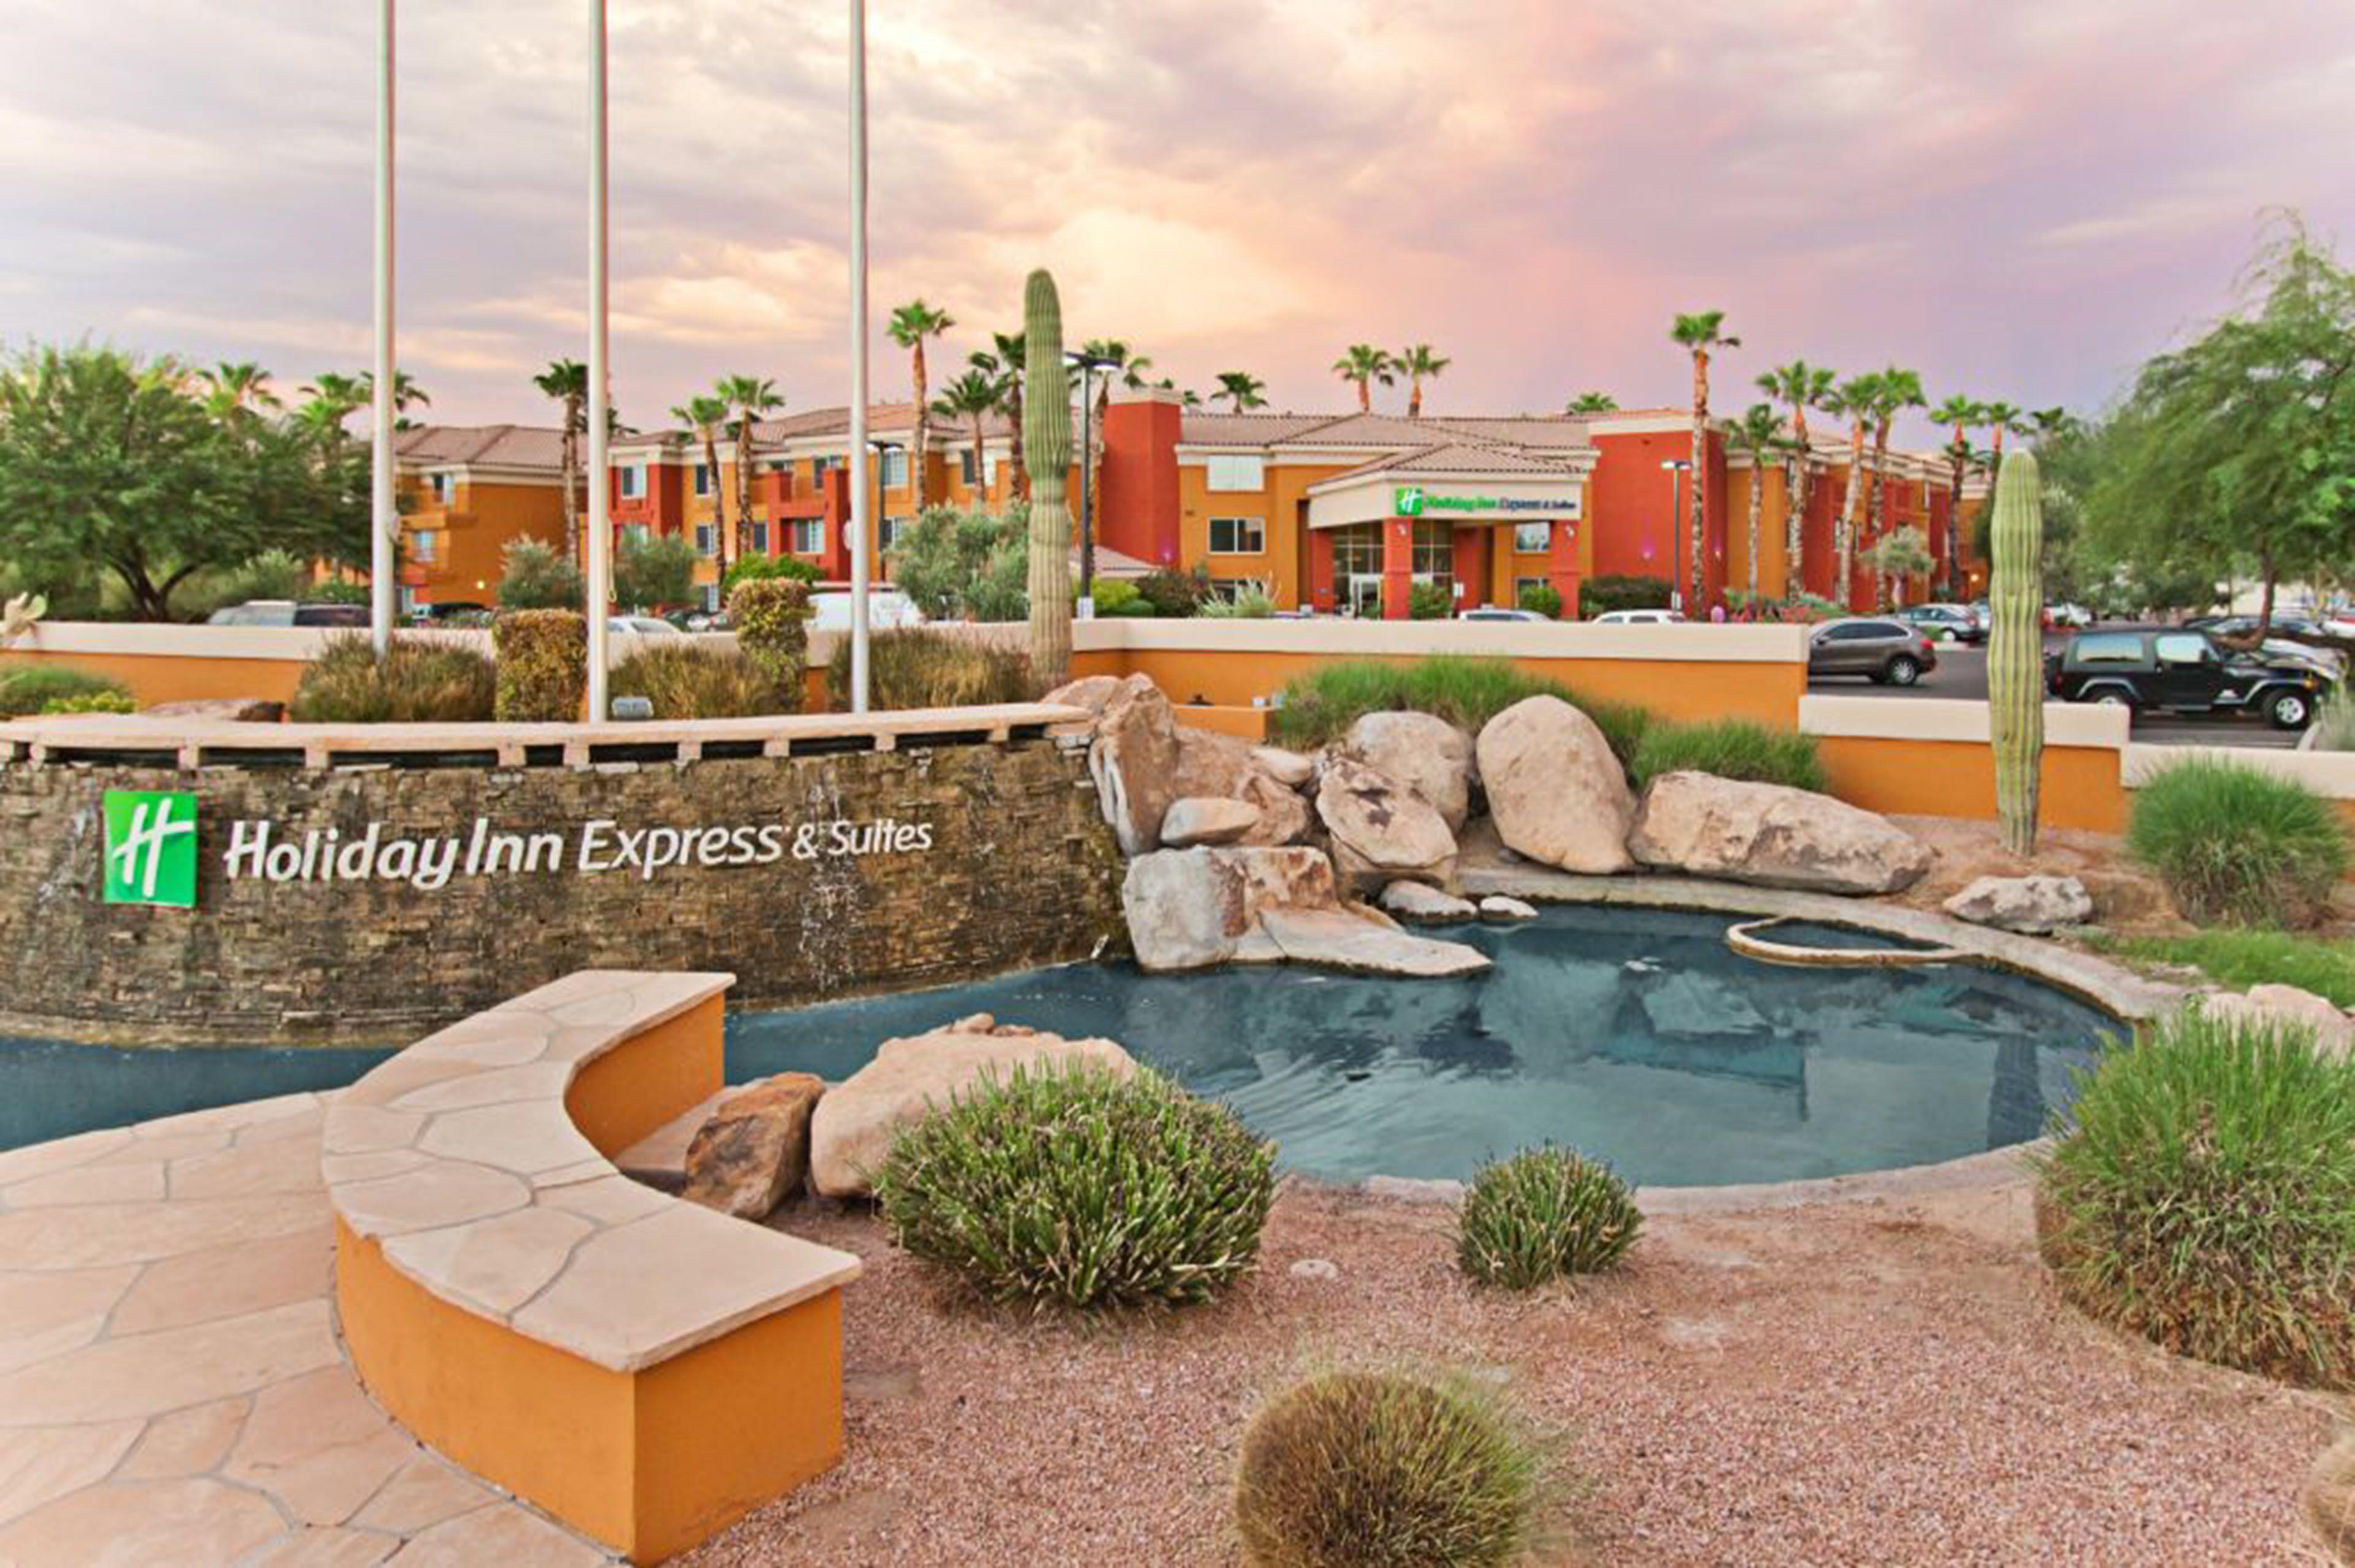 Holiday Inn Express & Suites Scottsburg image 5